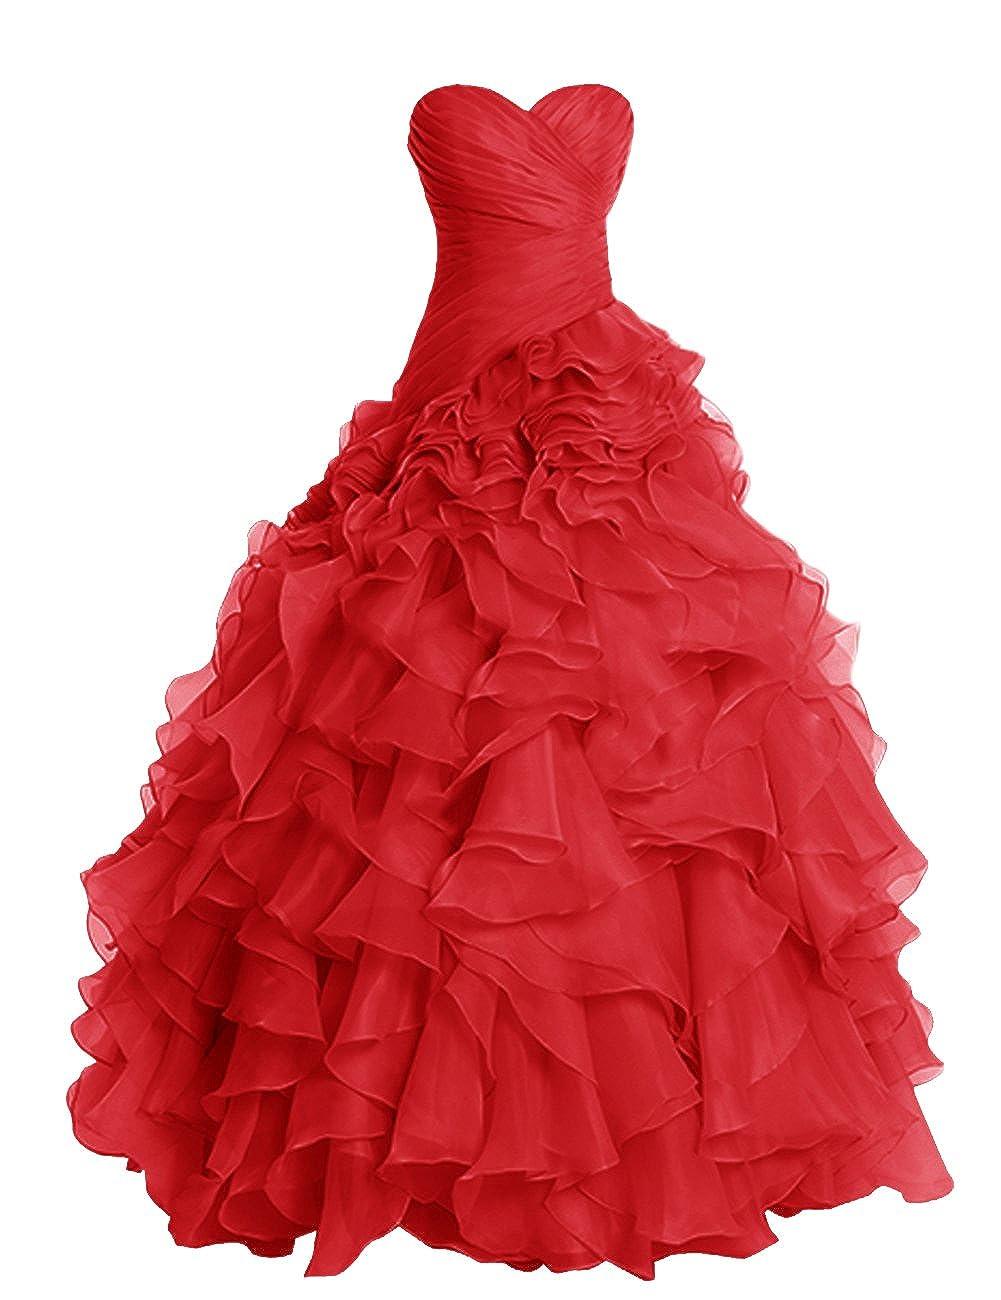 Red Dresstells® Long Prom Dress Fluffy Bridesmaid Dress Wedding Dress with Ruffles